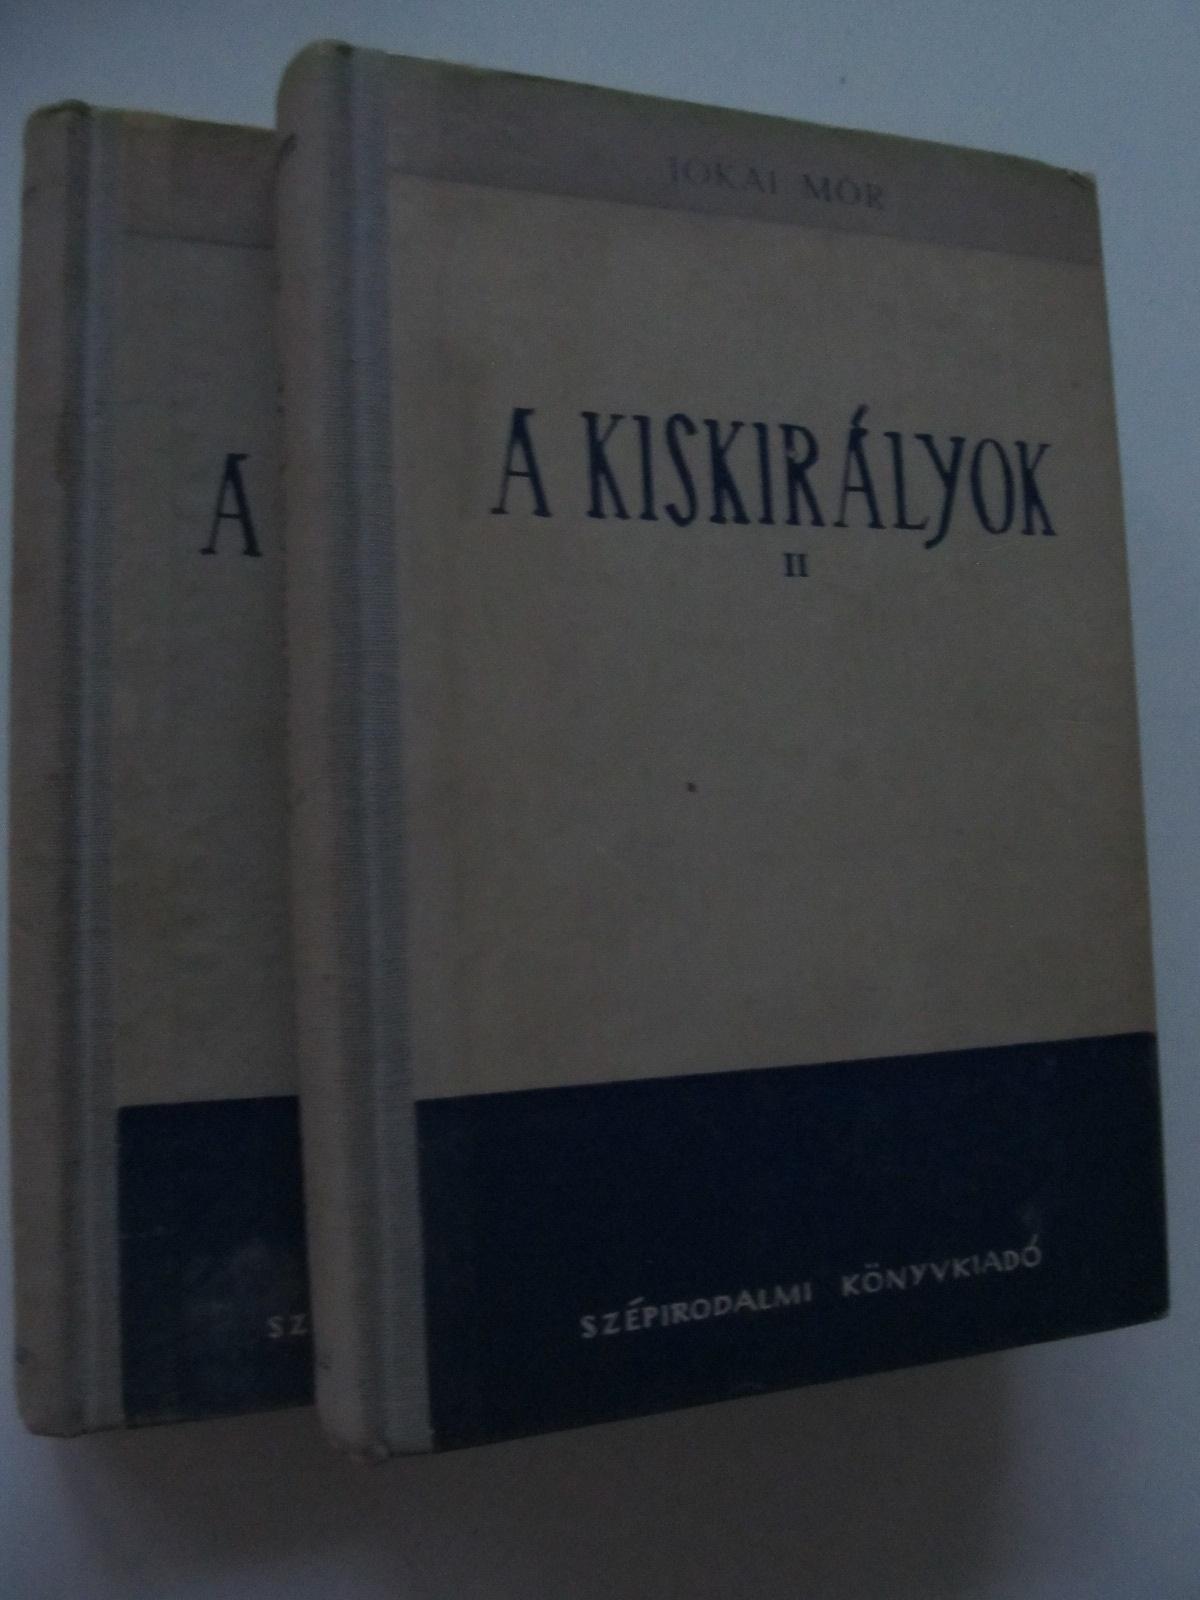 A kiskiralyiok (2 vol.) - Jokai Mor | Detalii carte